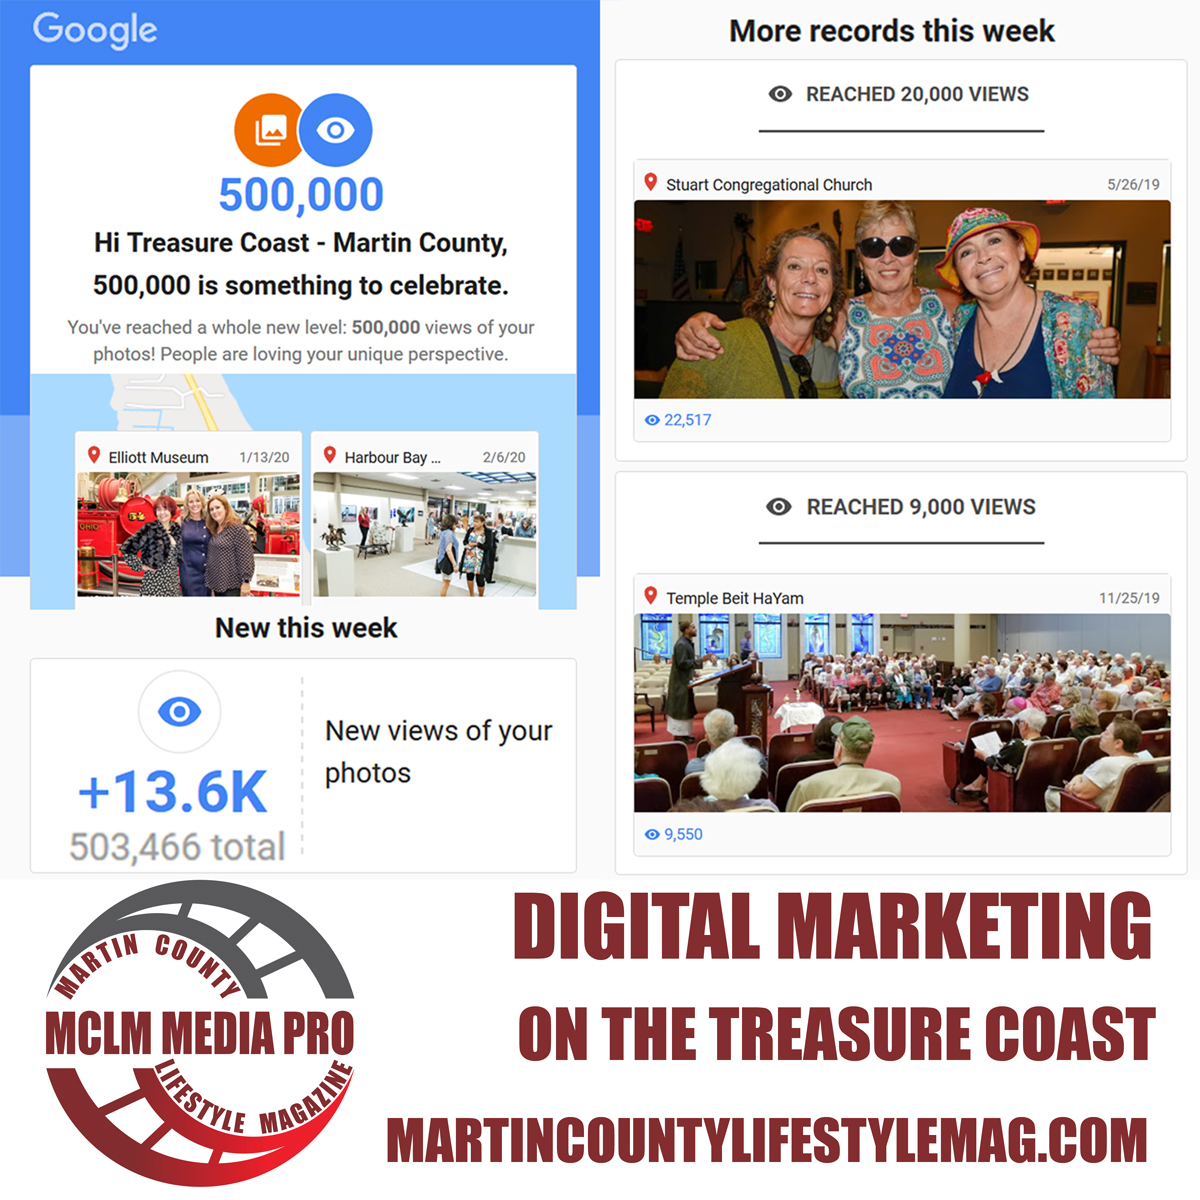 MCLM Media Pro - Photography, Video Production, and Social Media Marketing on the Treasure Coast